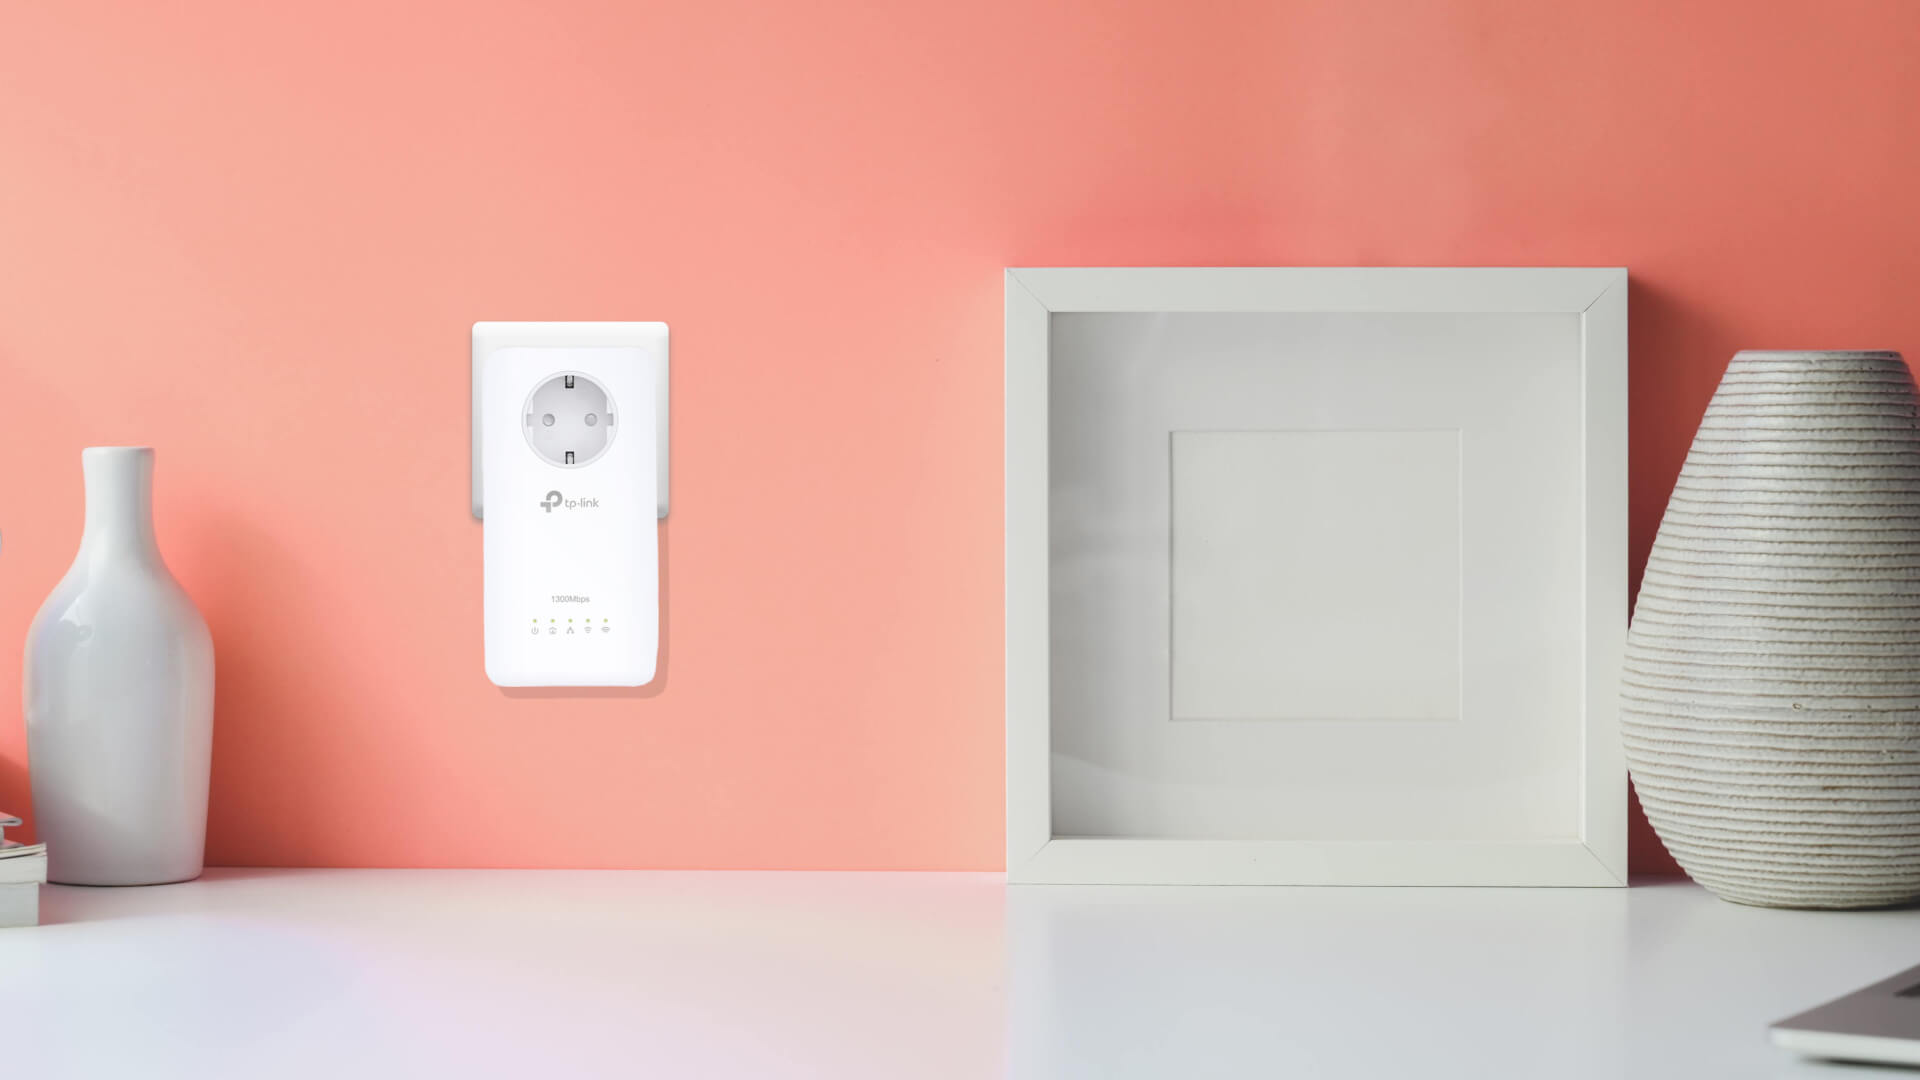 internet via stopcontact powerline adapter